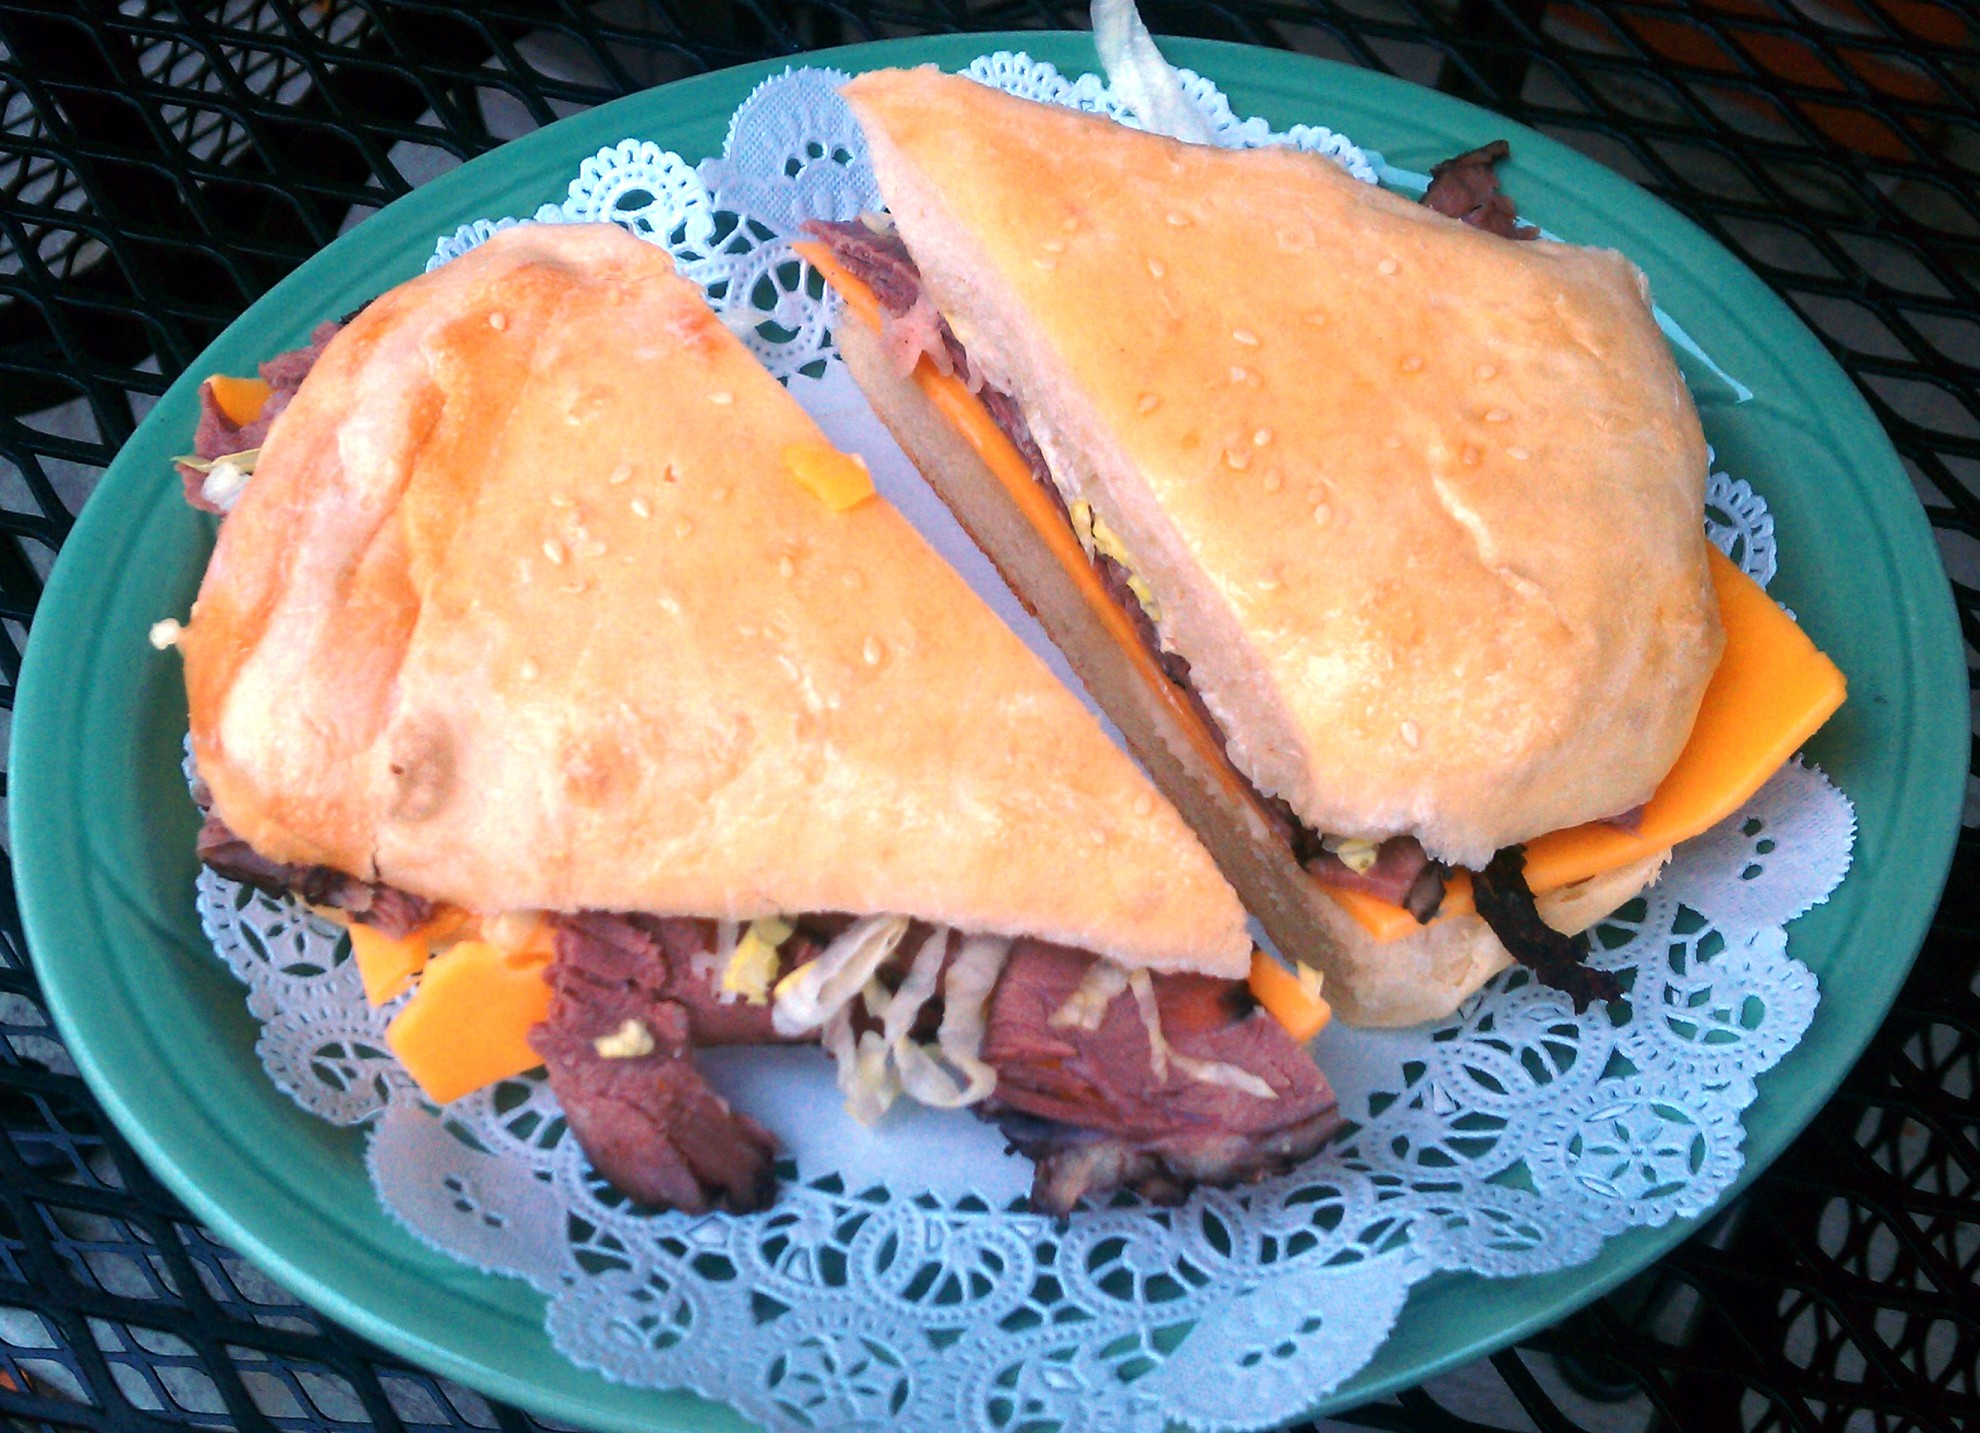 Roast Beef & Cheddar on a Freshly Baked Roll